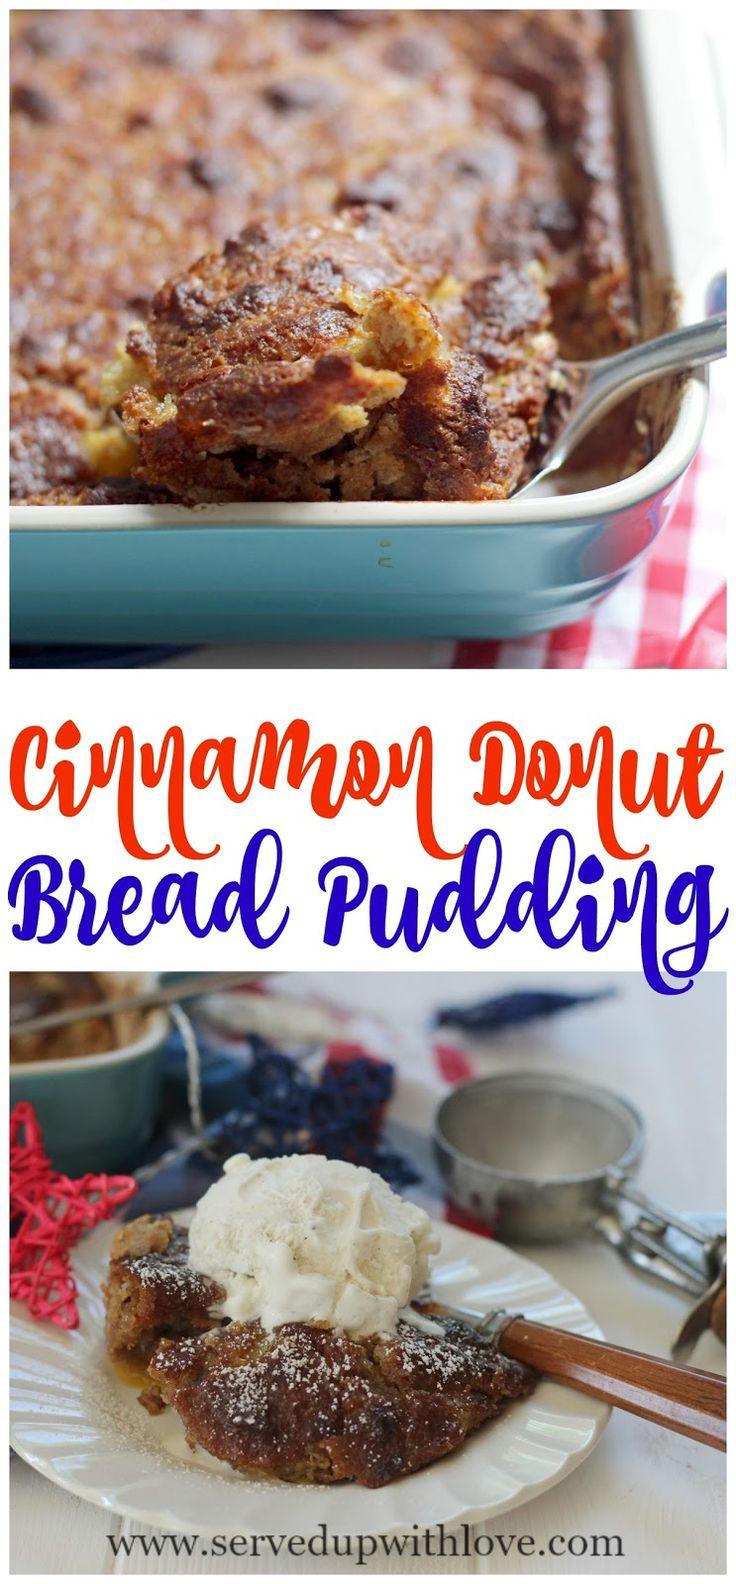 Cinnamon Donut Bread Pudding recipe from Served Up With Love using Farm Rich Bakery Cinnamon Donut Holes. @farmrichsnacks #FarmRich #ad www.servedupwithlove.com